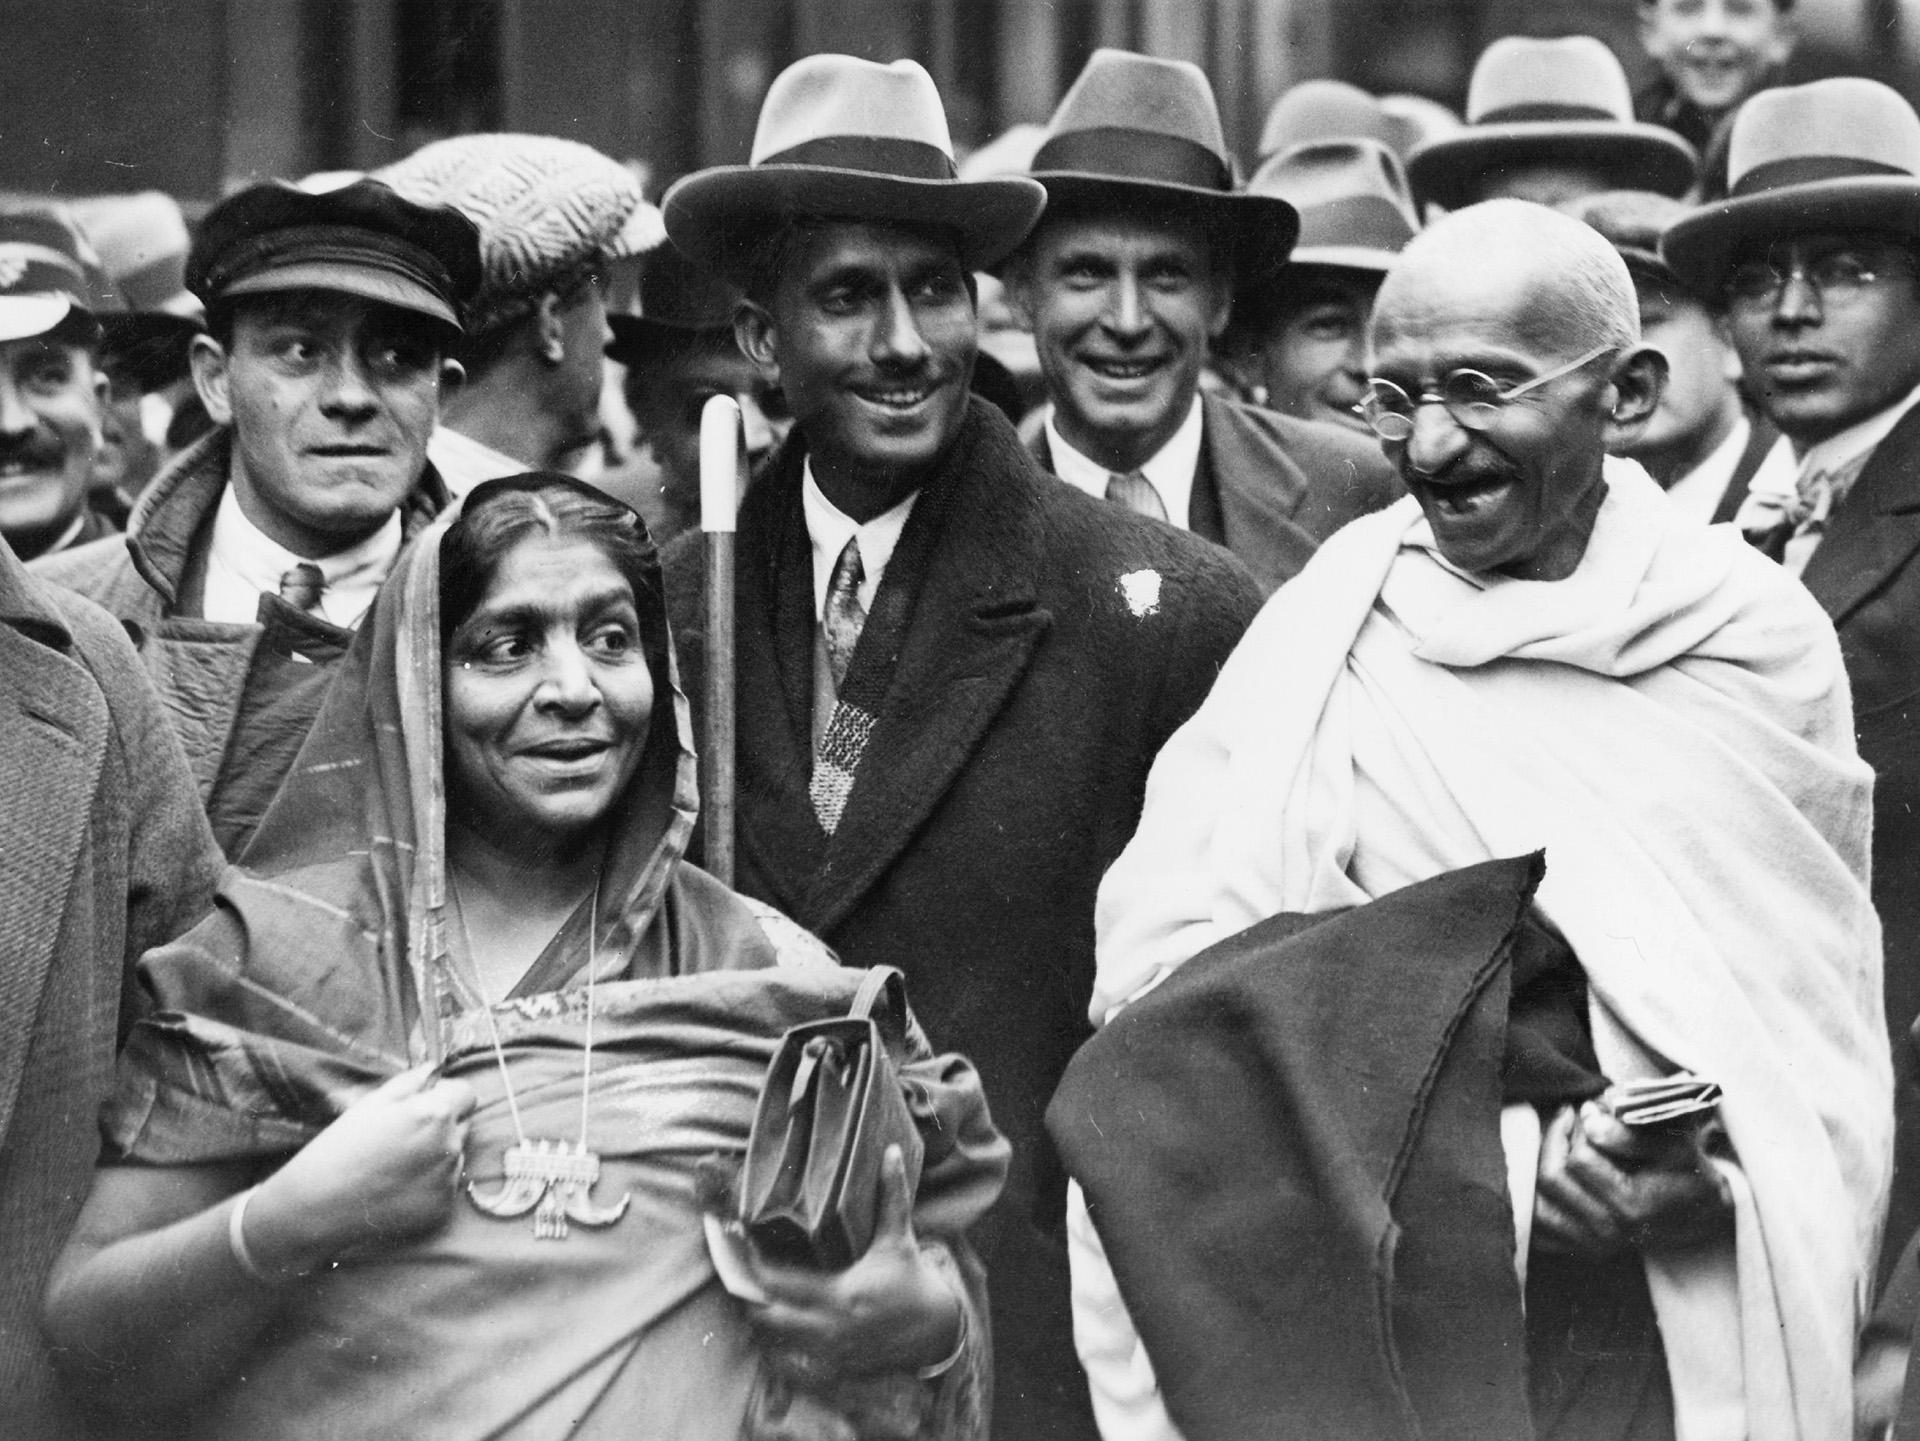 Gandhi en Inglaterra junto a la activista Sarojini Naidu (Douglas Miller/Getty Images)